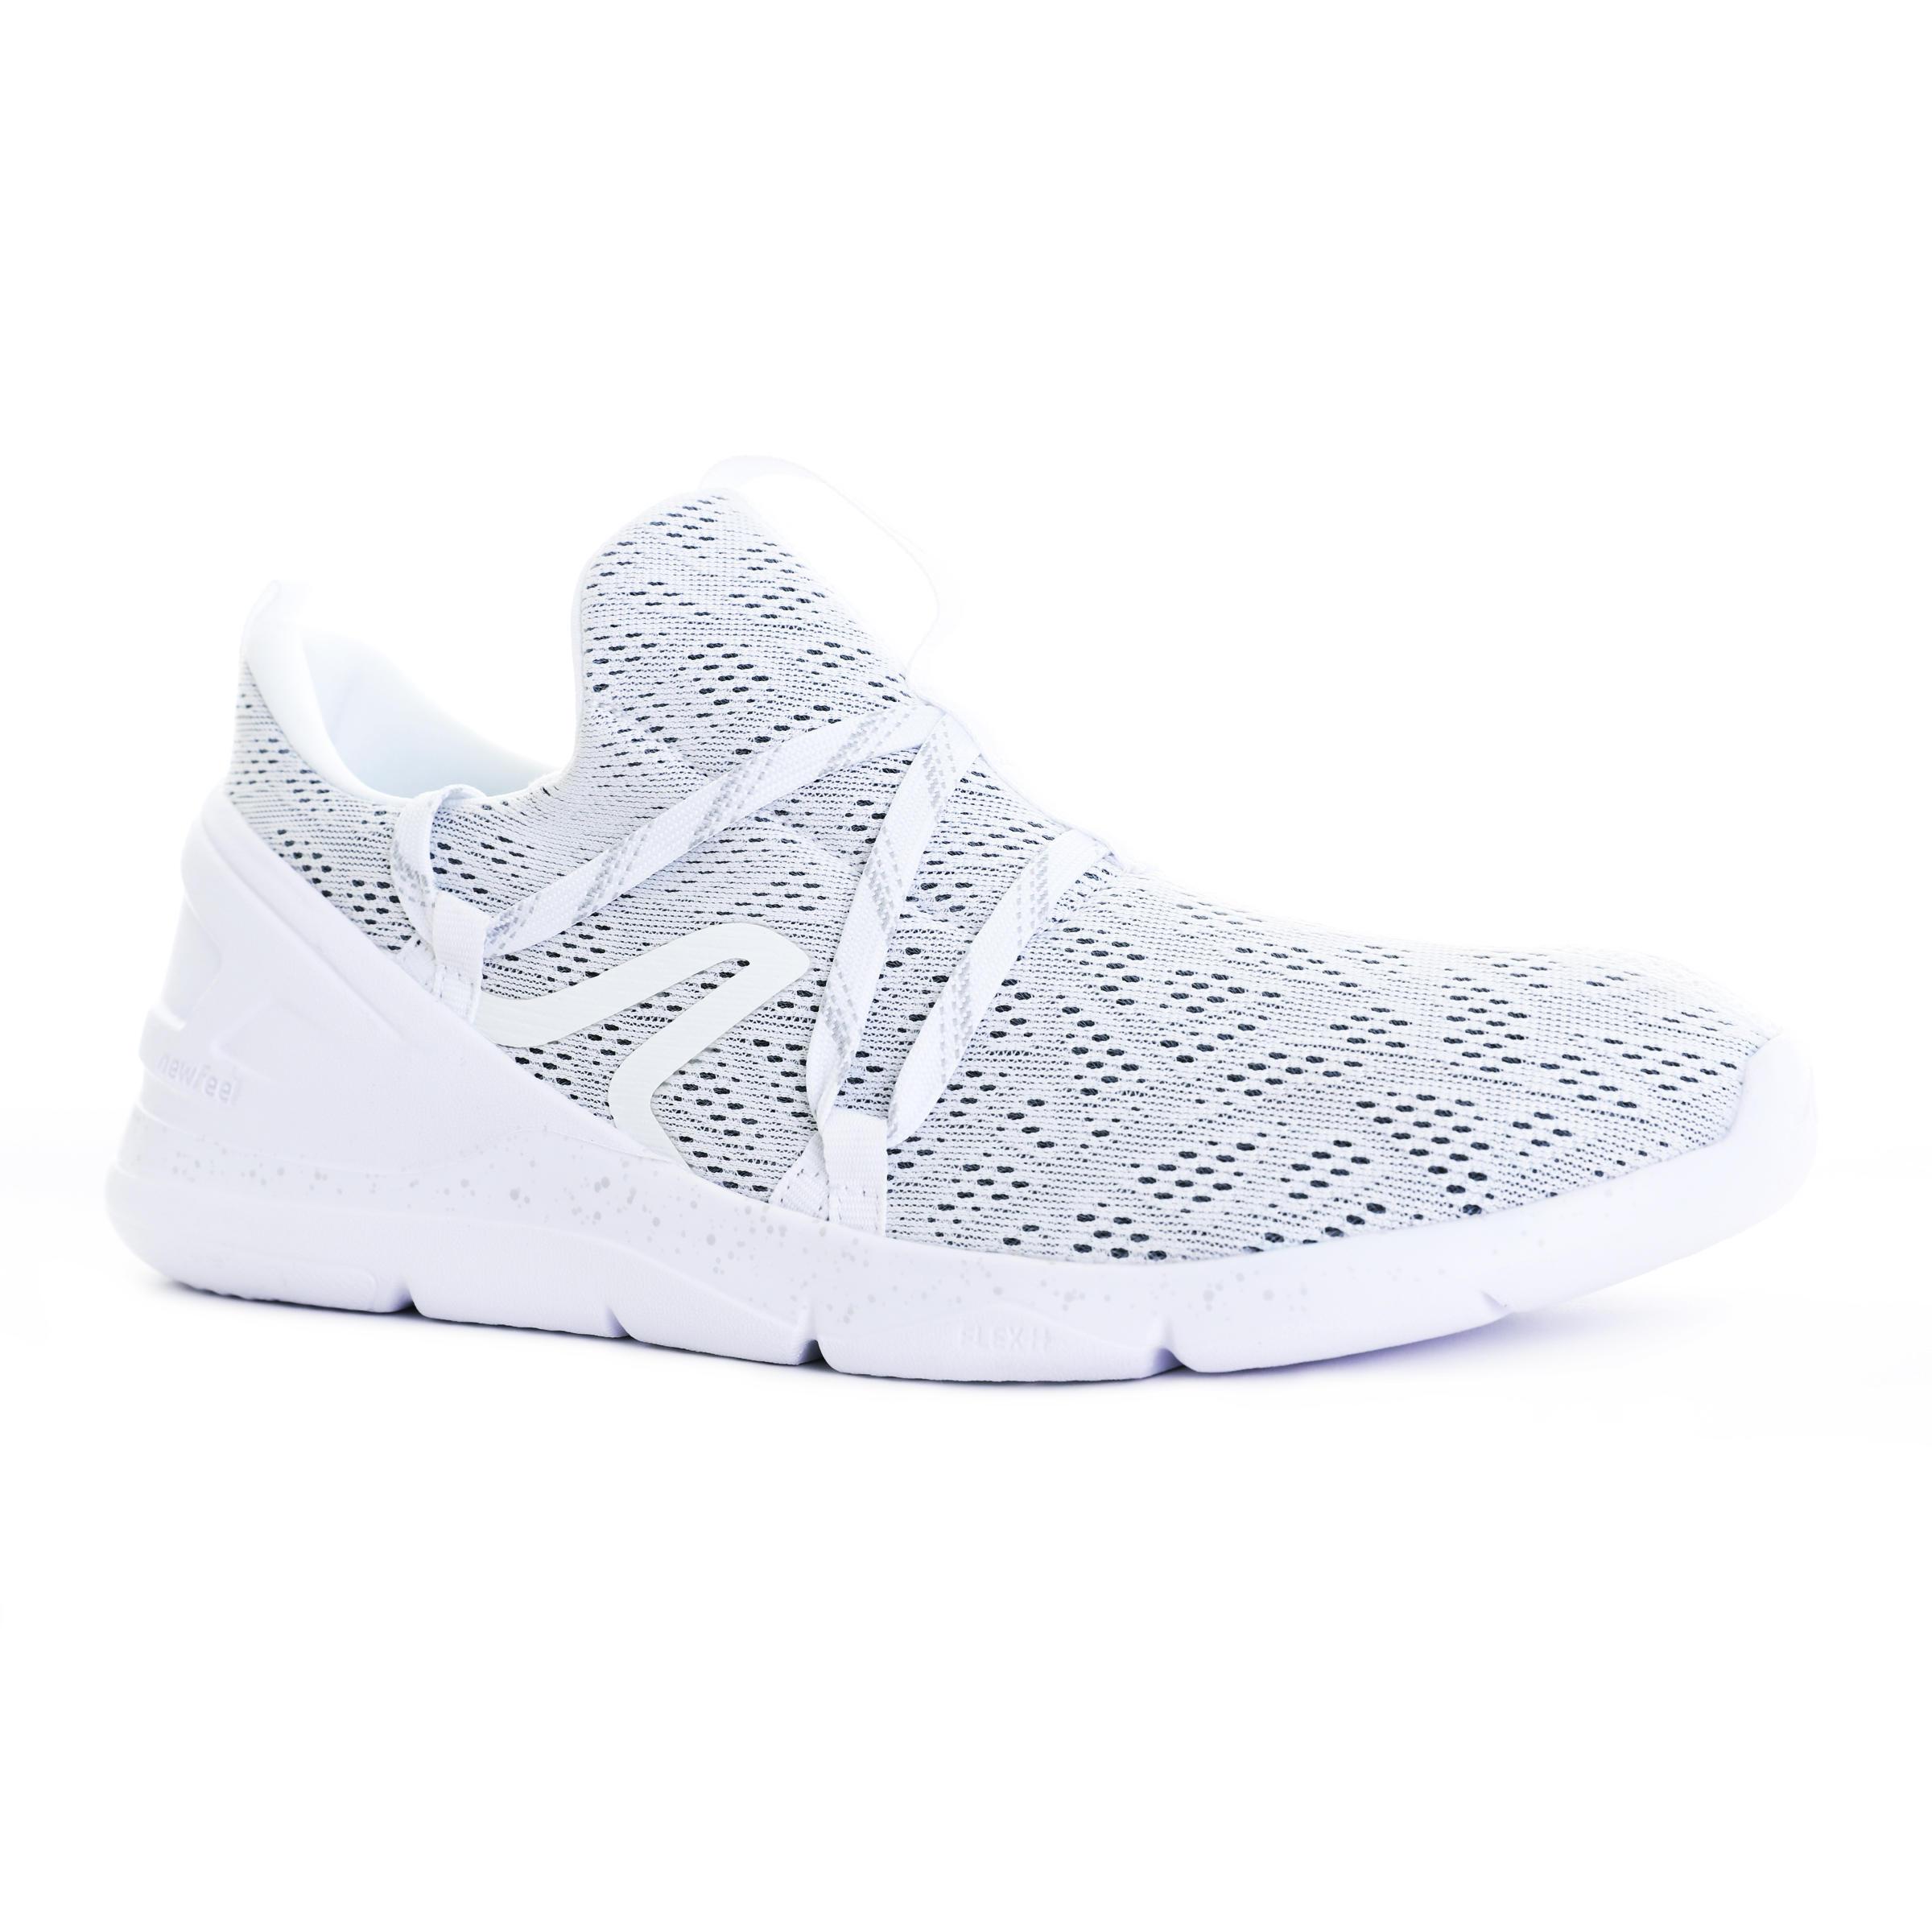 Newfeel Chaussures marche sportive homme PW 140 blanc - Newfeel